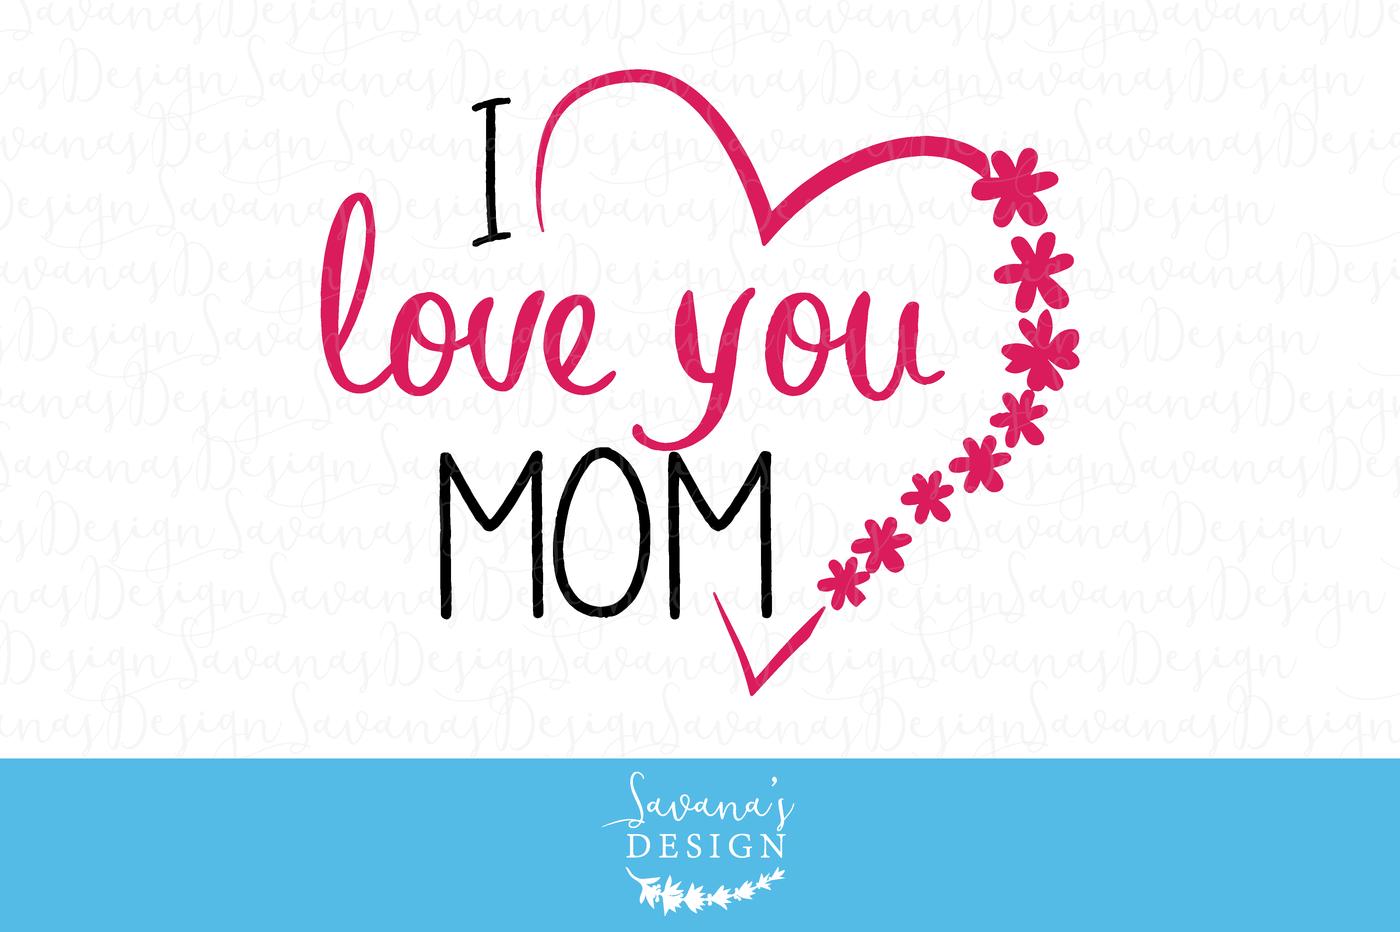 I Love You Mom Svg I Love U Mom I Love You Mom Images Svg Card